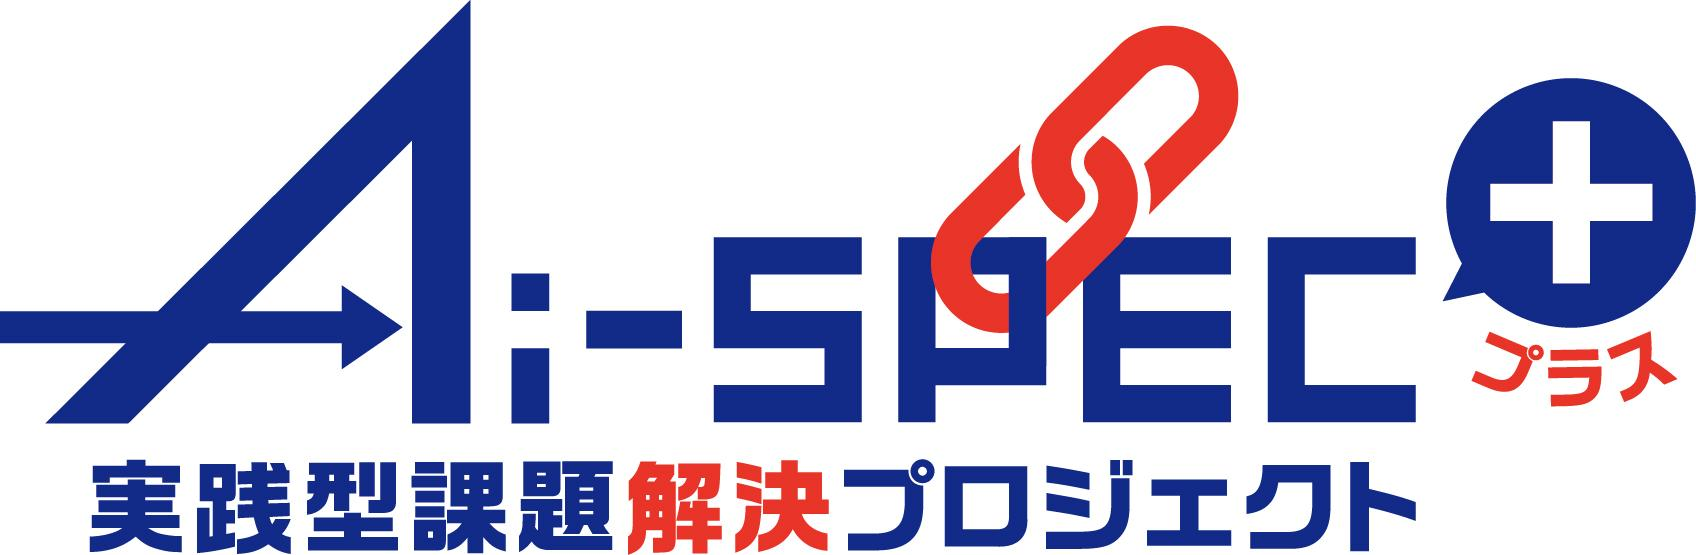 AiSPEC繝輔z繝ゥ繧ケ_繝ュ繧ウ繧呎アコ螳壽。?_0525.jpg